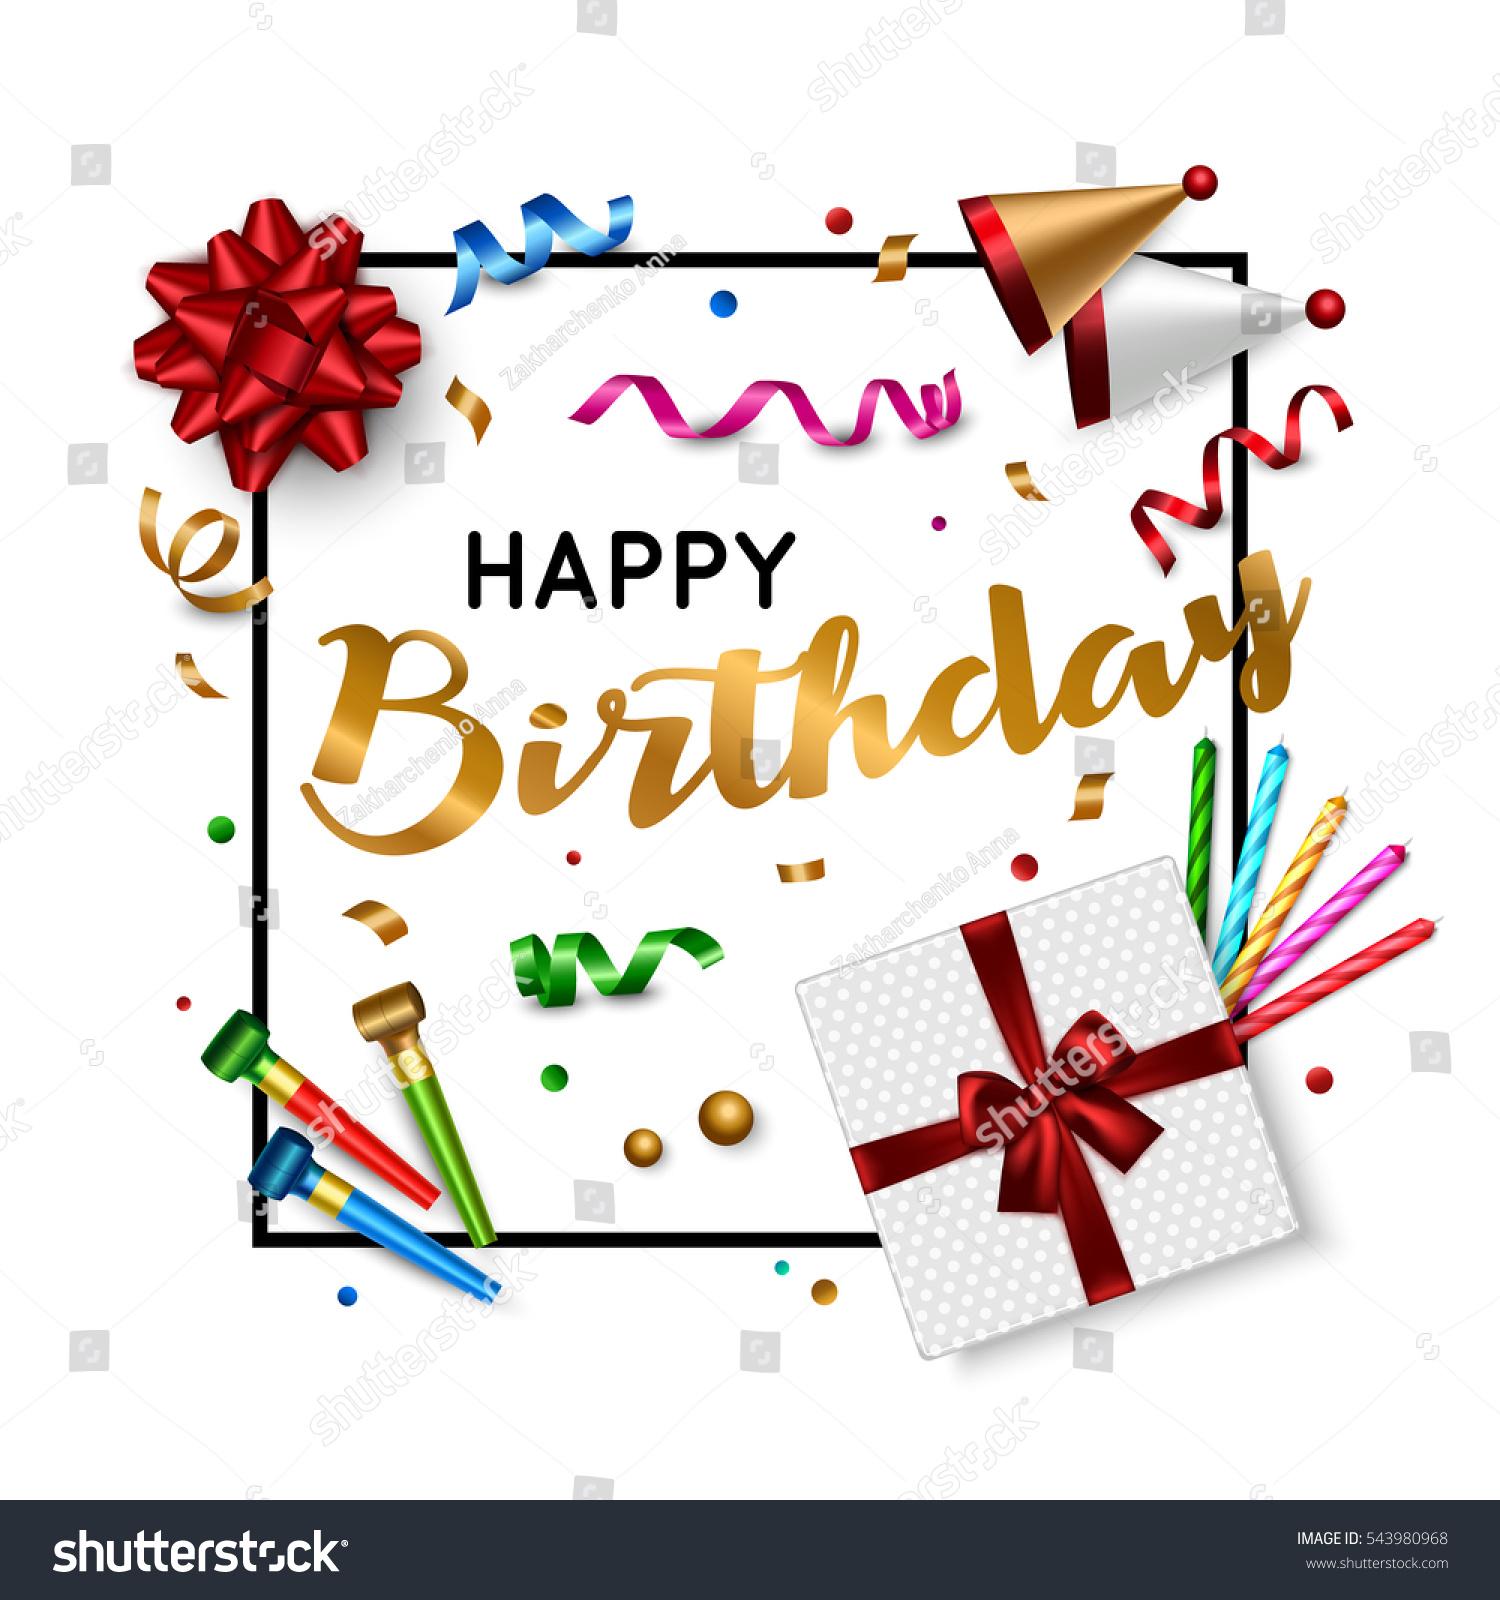 Happy Birthday Card Template Gift Box Image Vectorielle De Stock